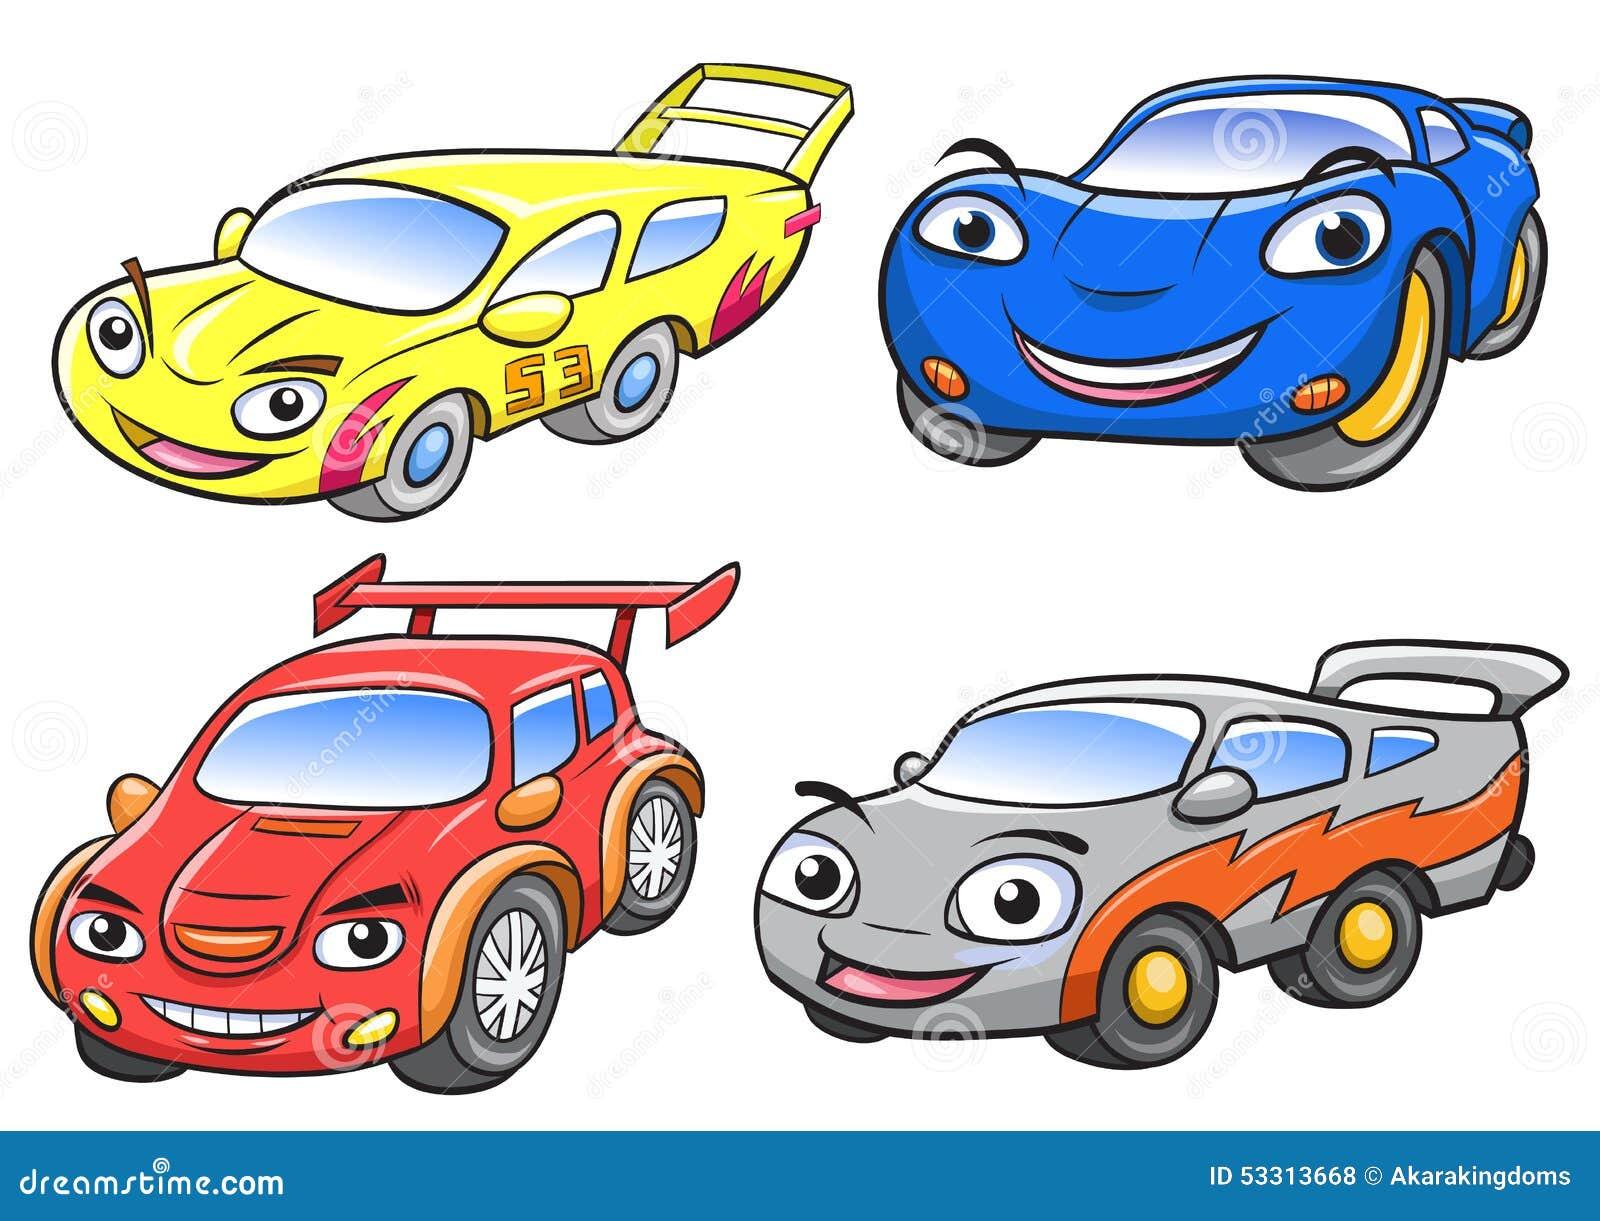 Vector Illustration Of Cute Cartoon Racing Car Characters Stock